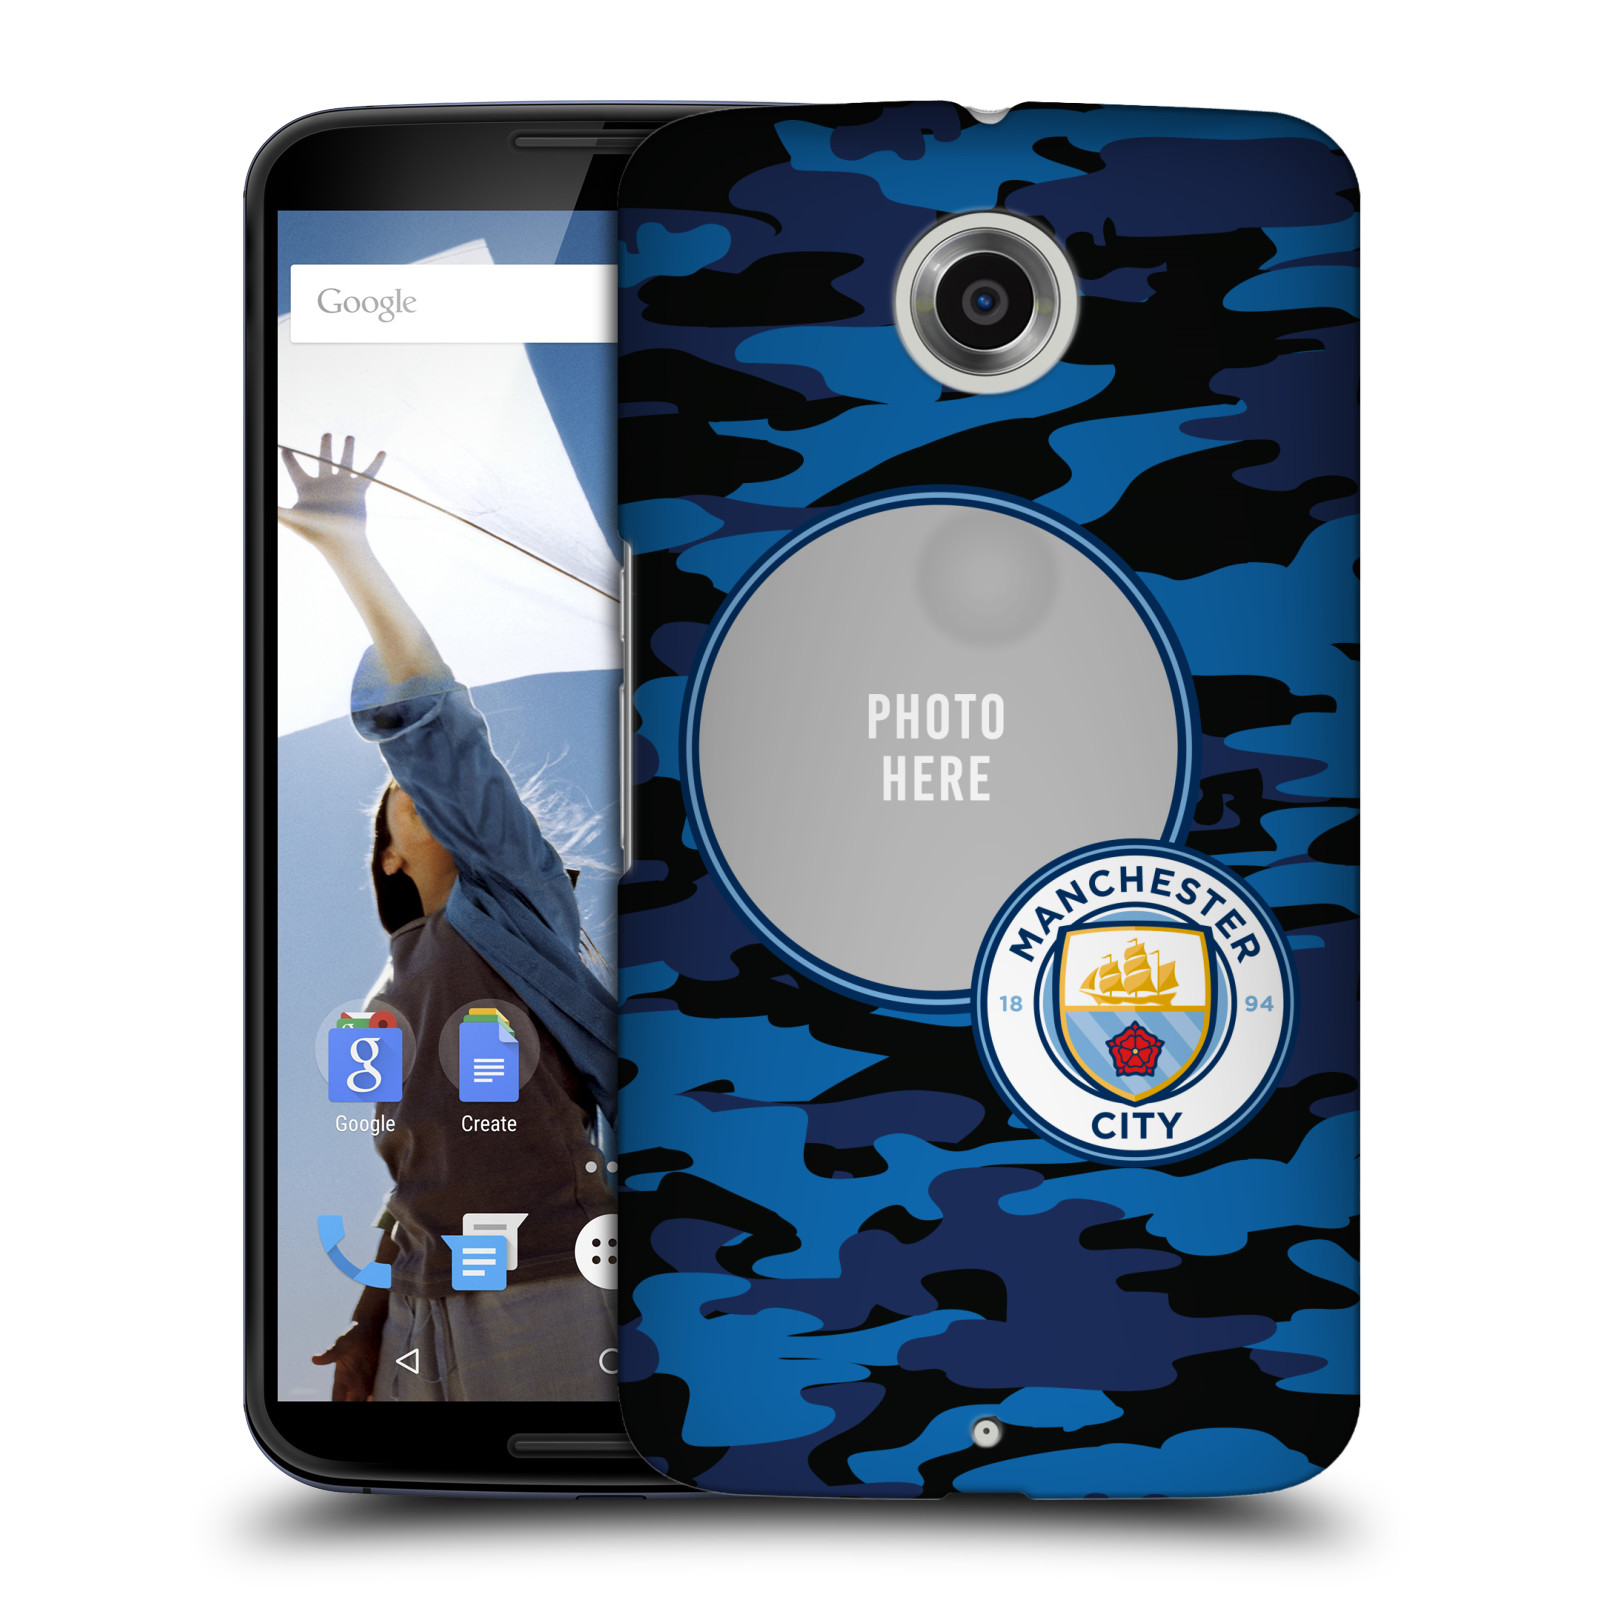 CUSTOM-MANCHESTER-CITY-FC-2017-18-KIT-E-LOGO-COVER-RETRO-PER-MOTOROLA-TELEFONI-2